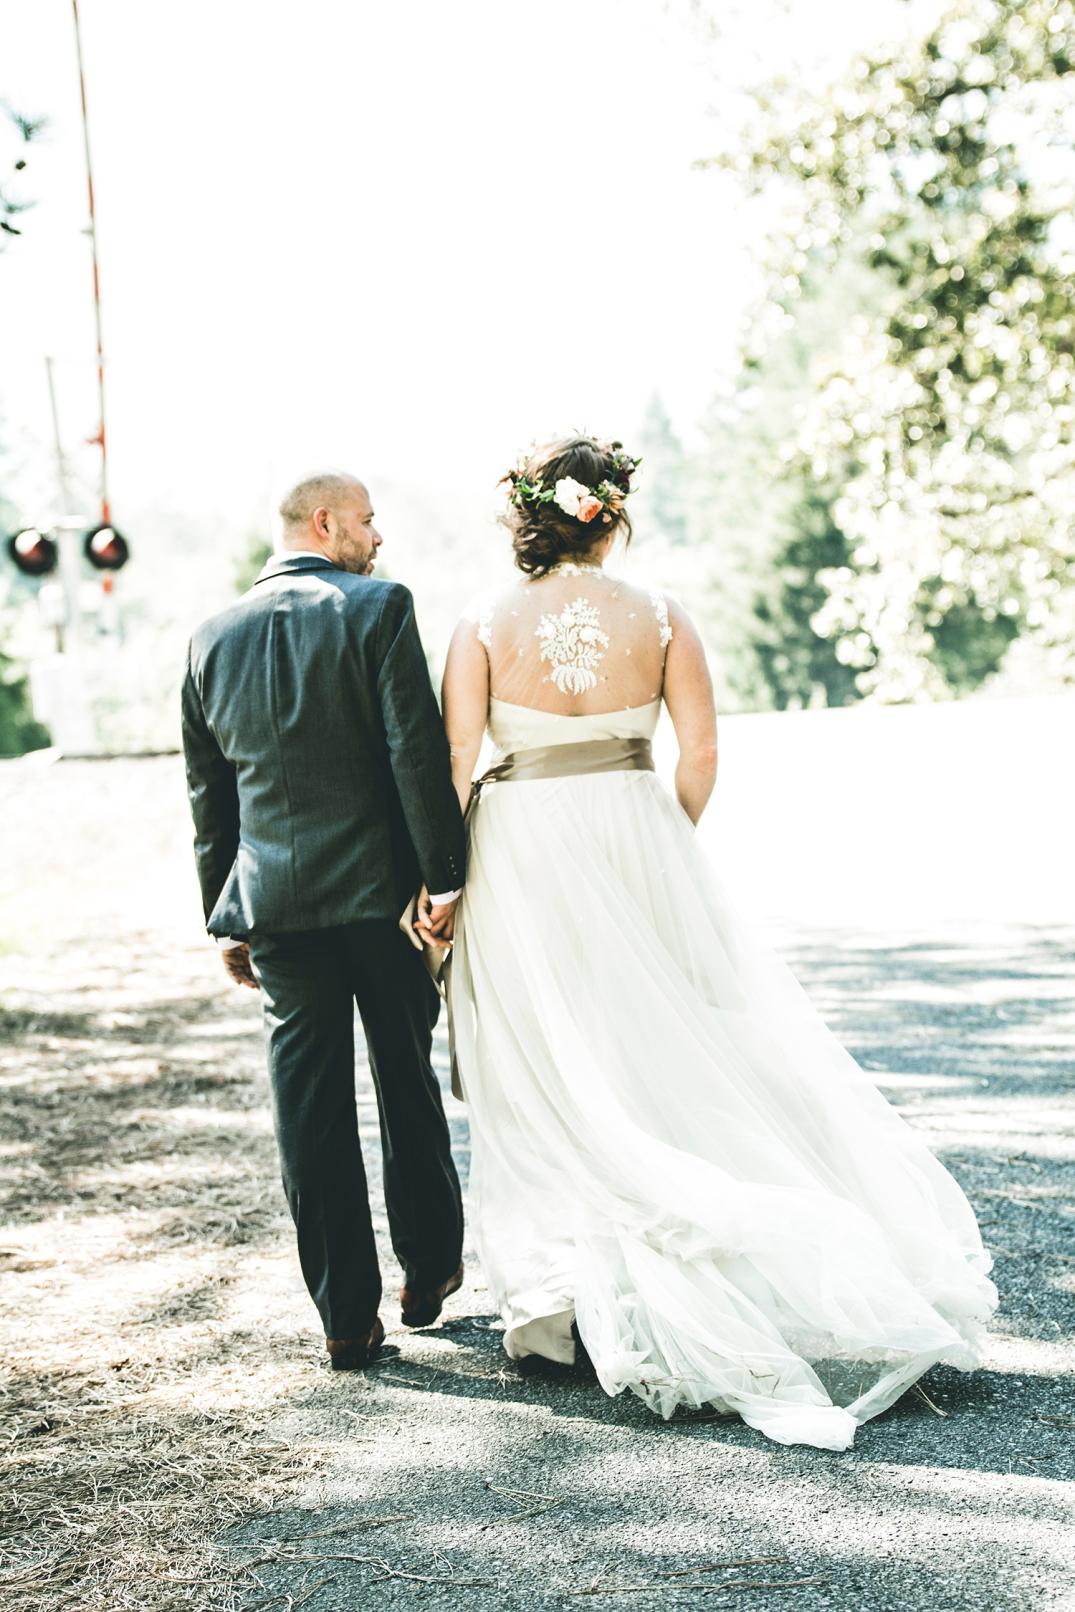 M&R River House Italian Wedding 2015DSC_4015